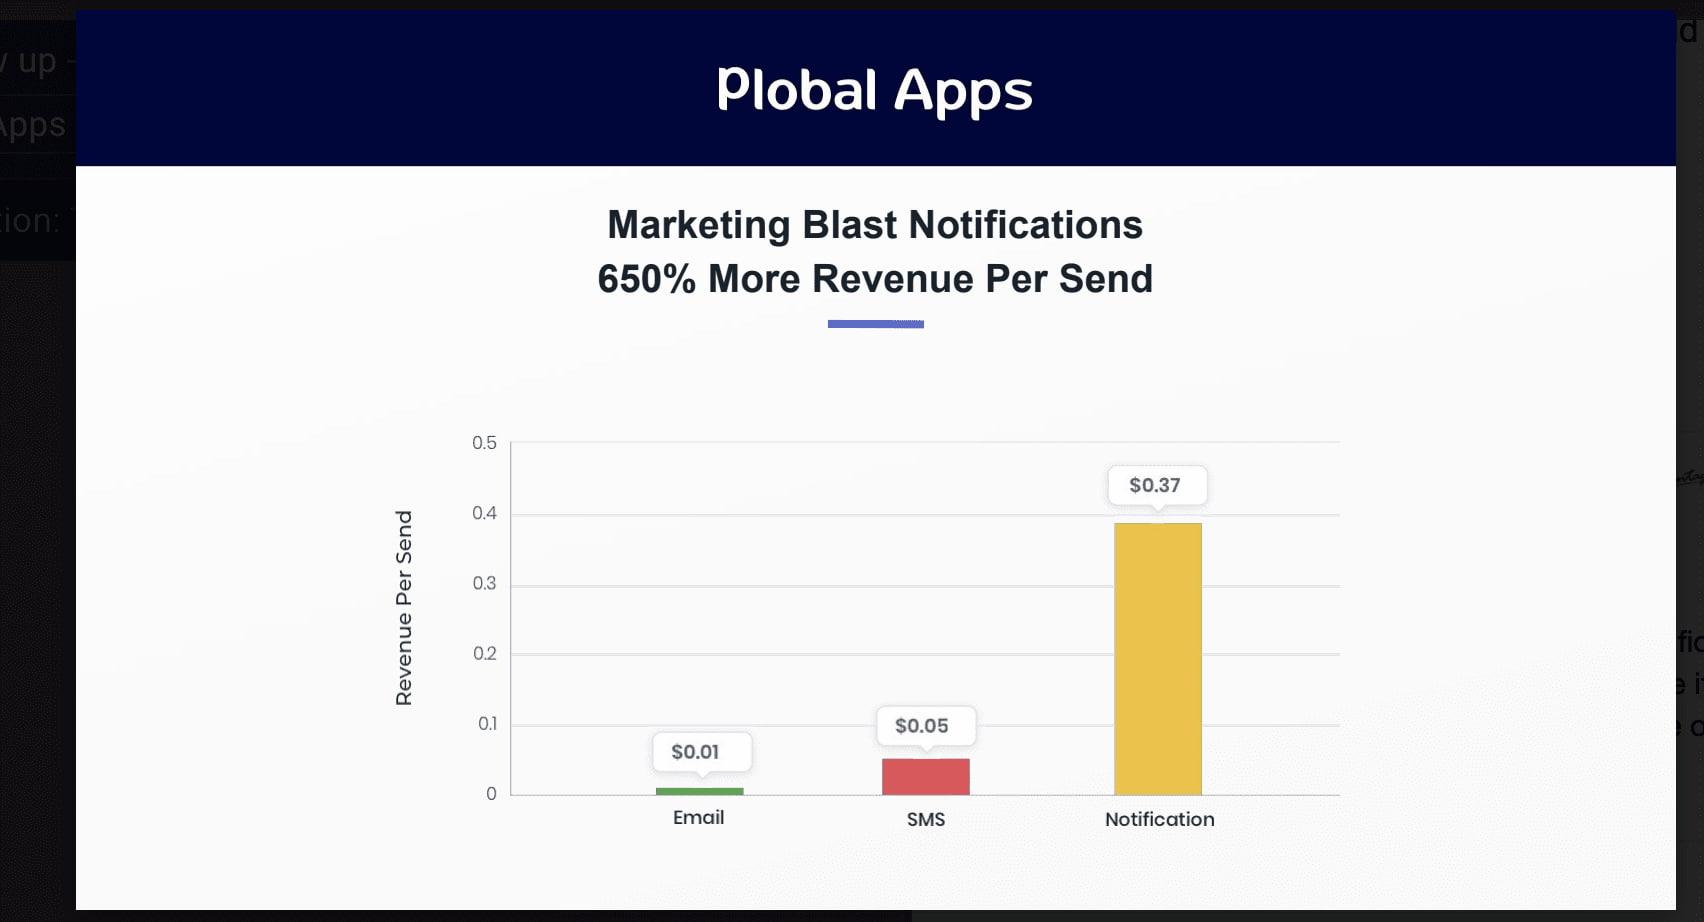 Marketing Blast Notifications